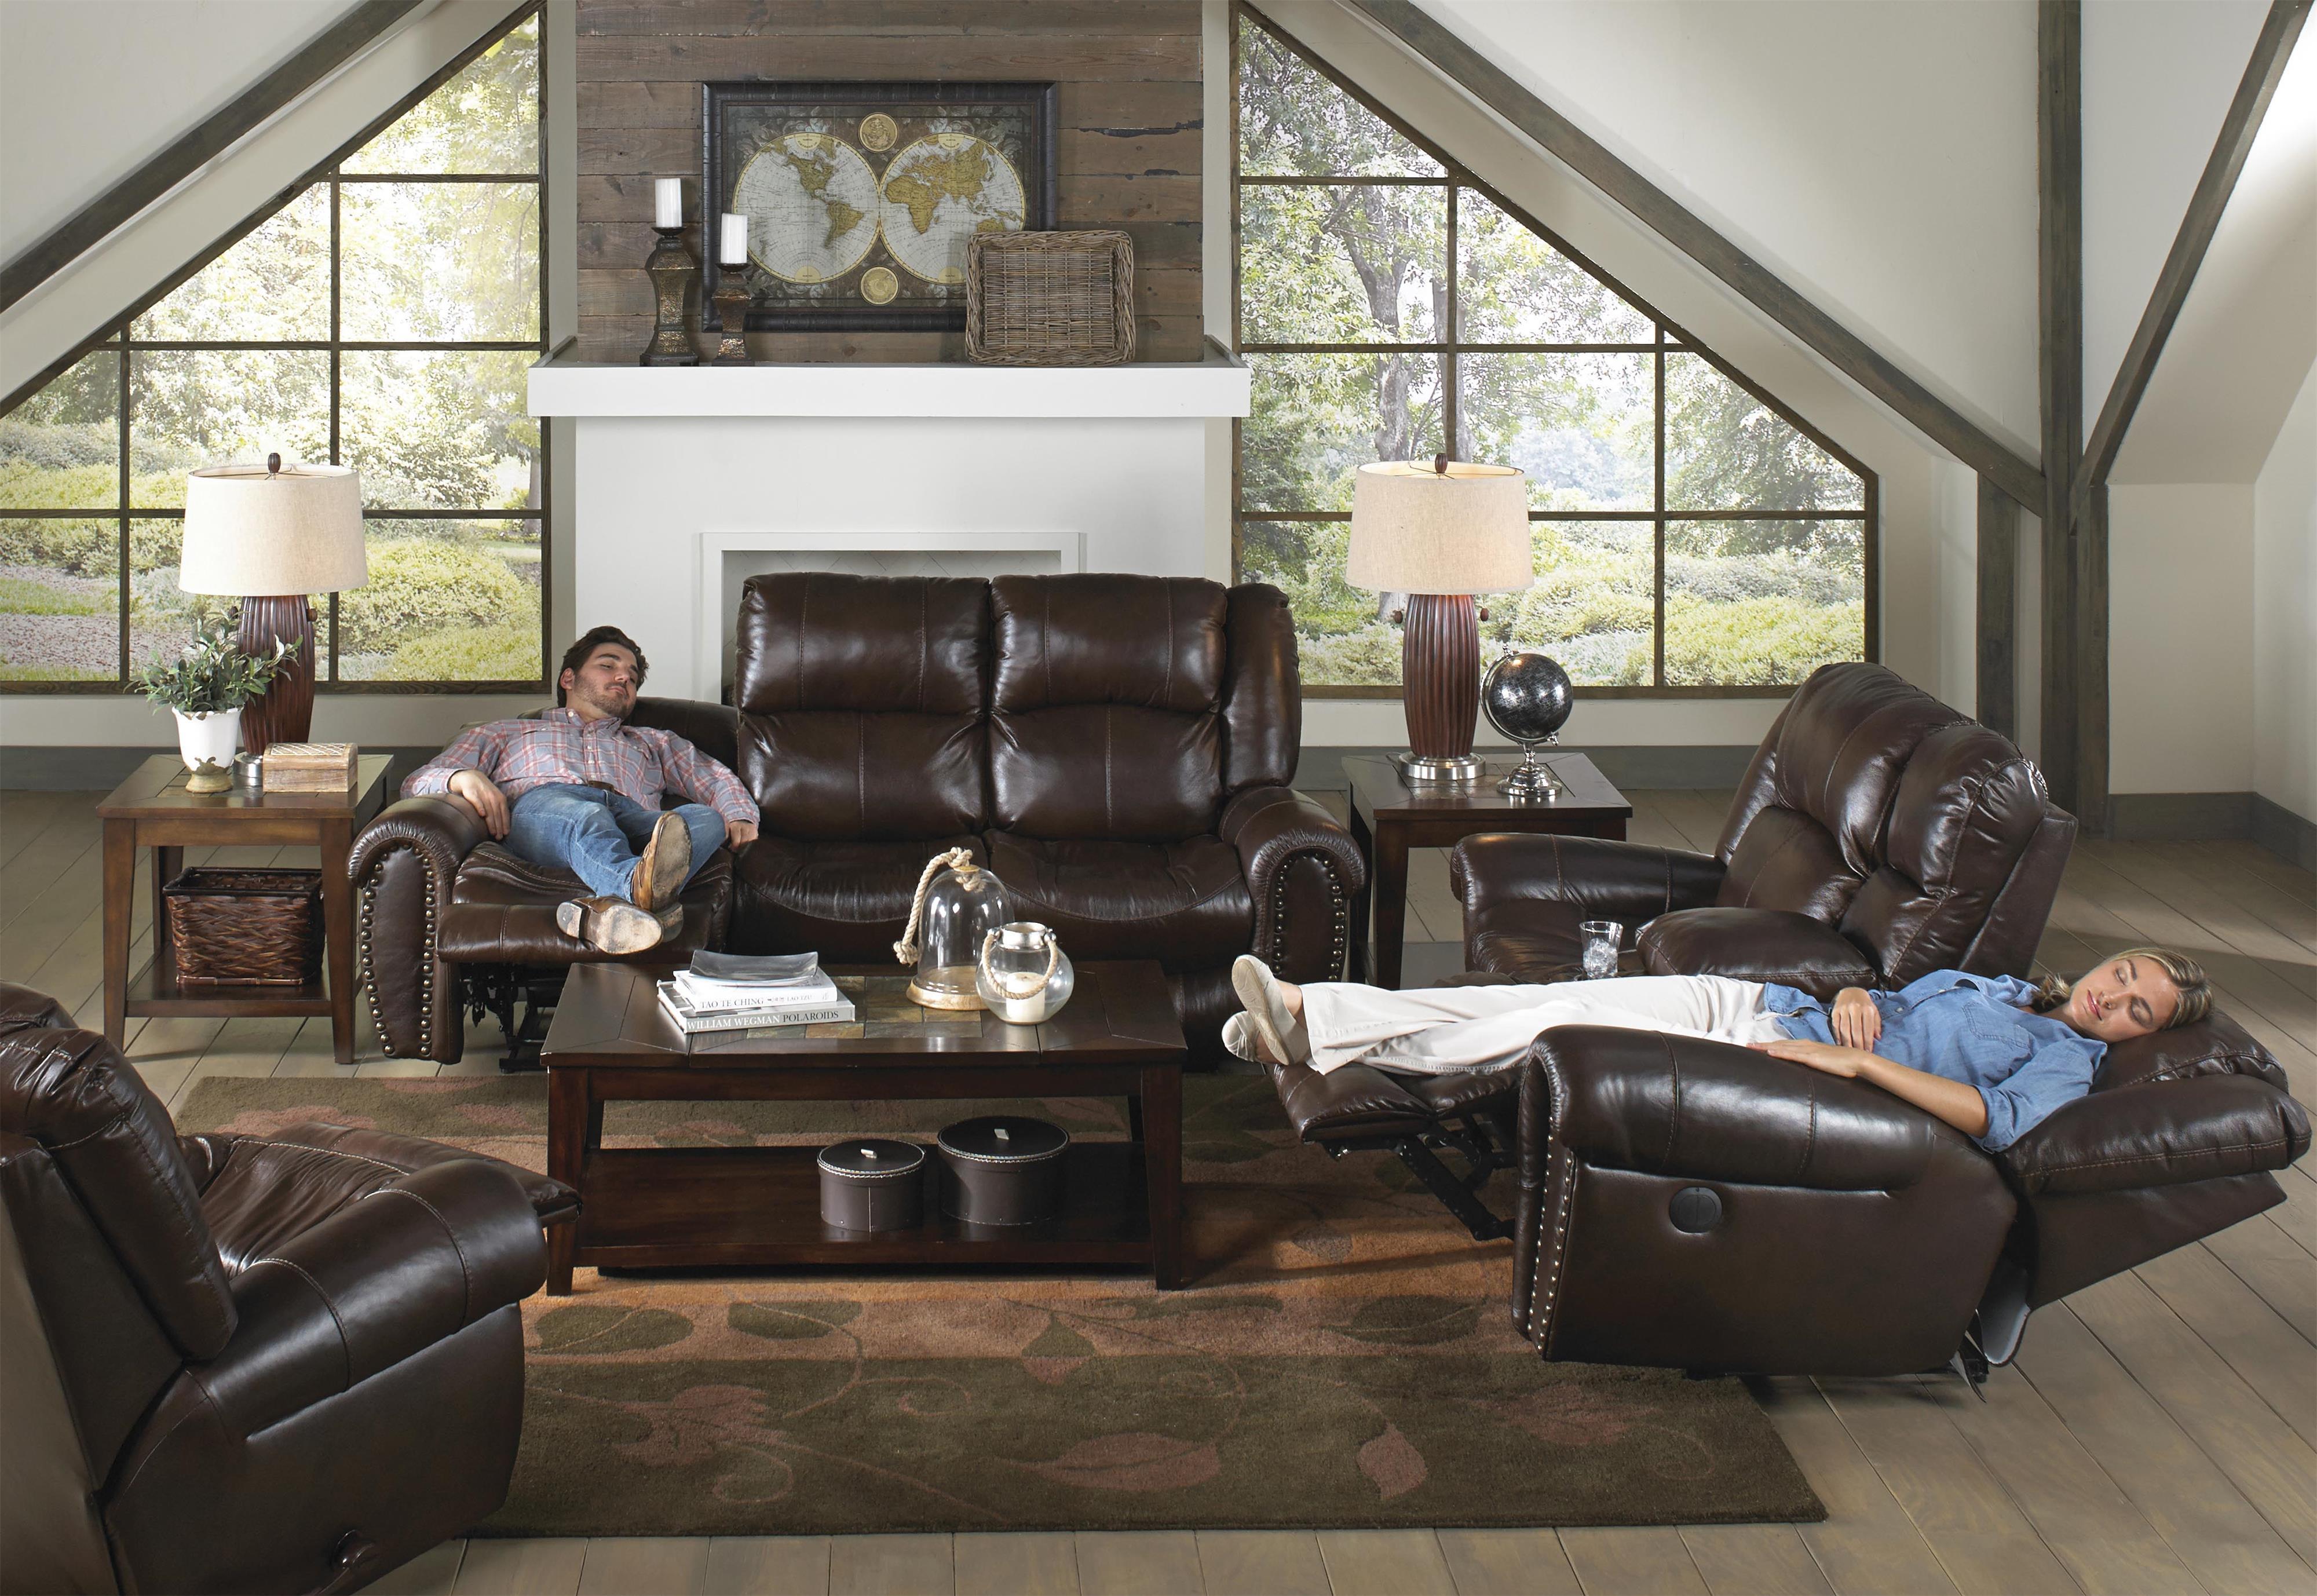 Catnapper 466 jordan reclining living room group for Living room june jordan